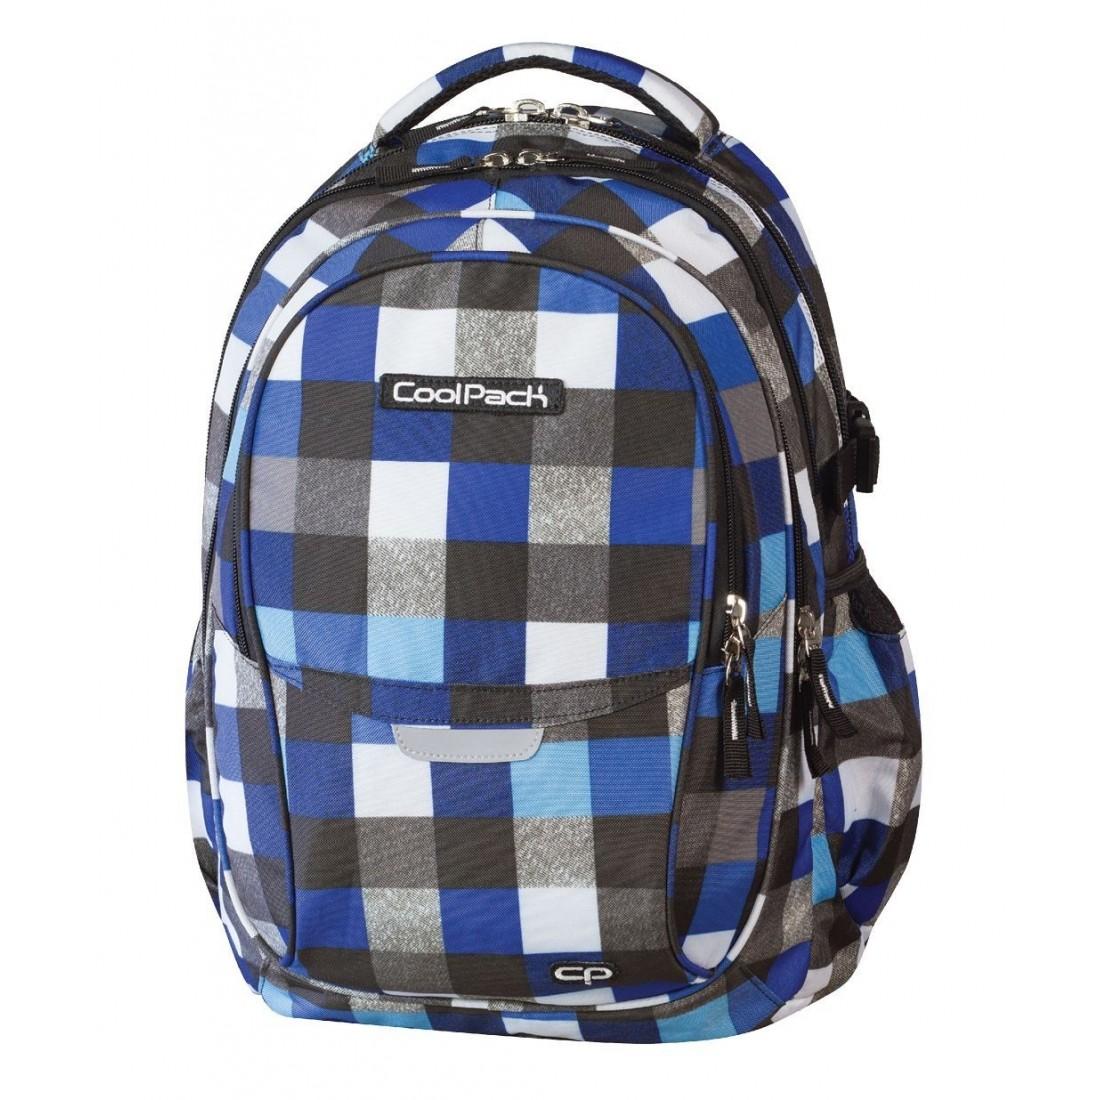 Plecak młodzieżowy CoolPack CP - 4 przegrody FACTOR BLUE SQUARED 446 - plecak-tornister.pl